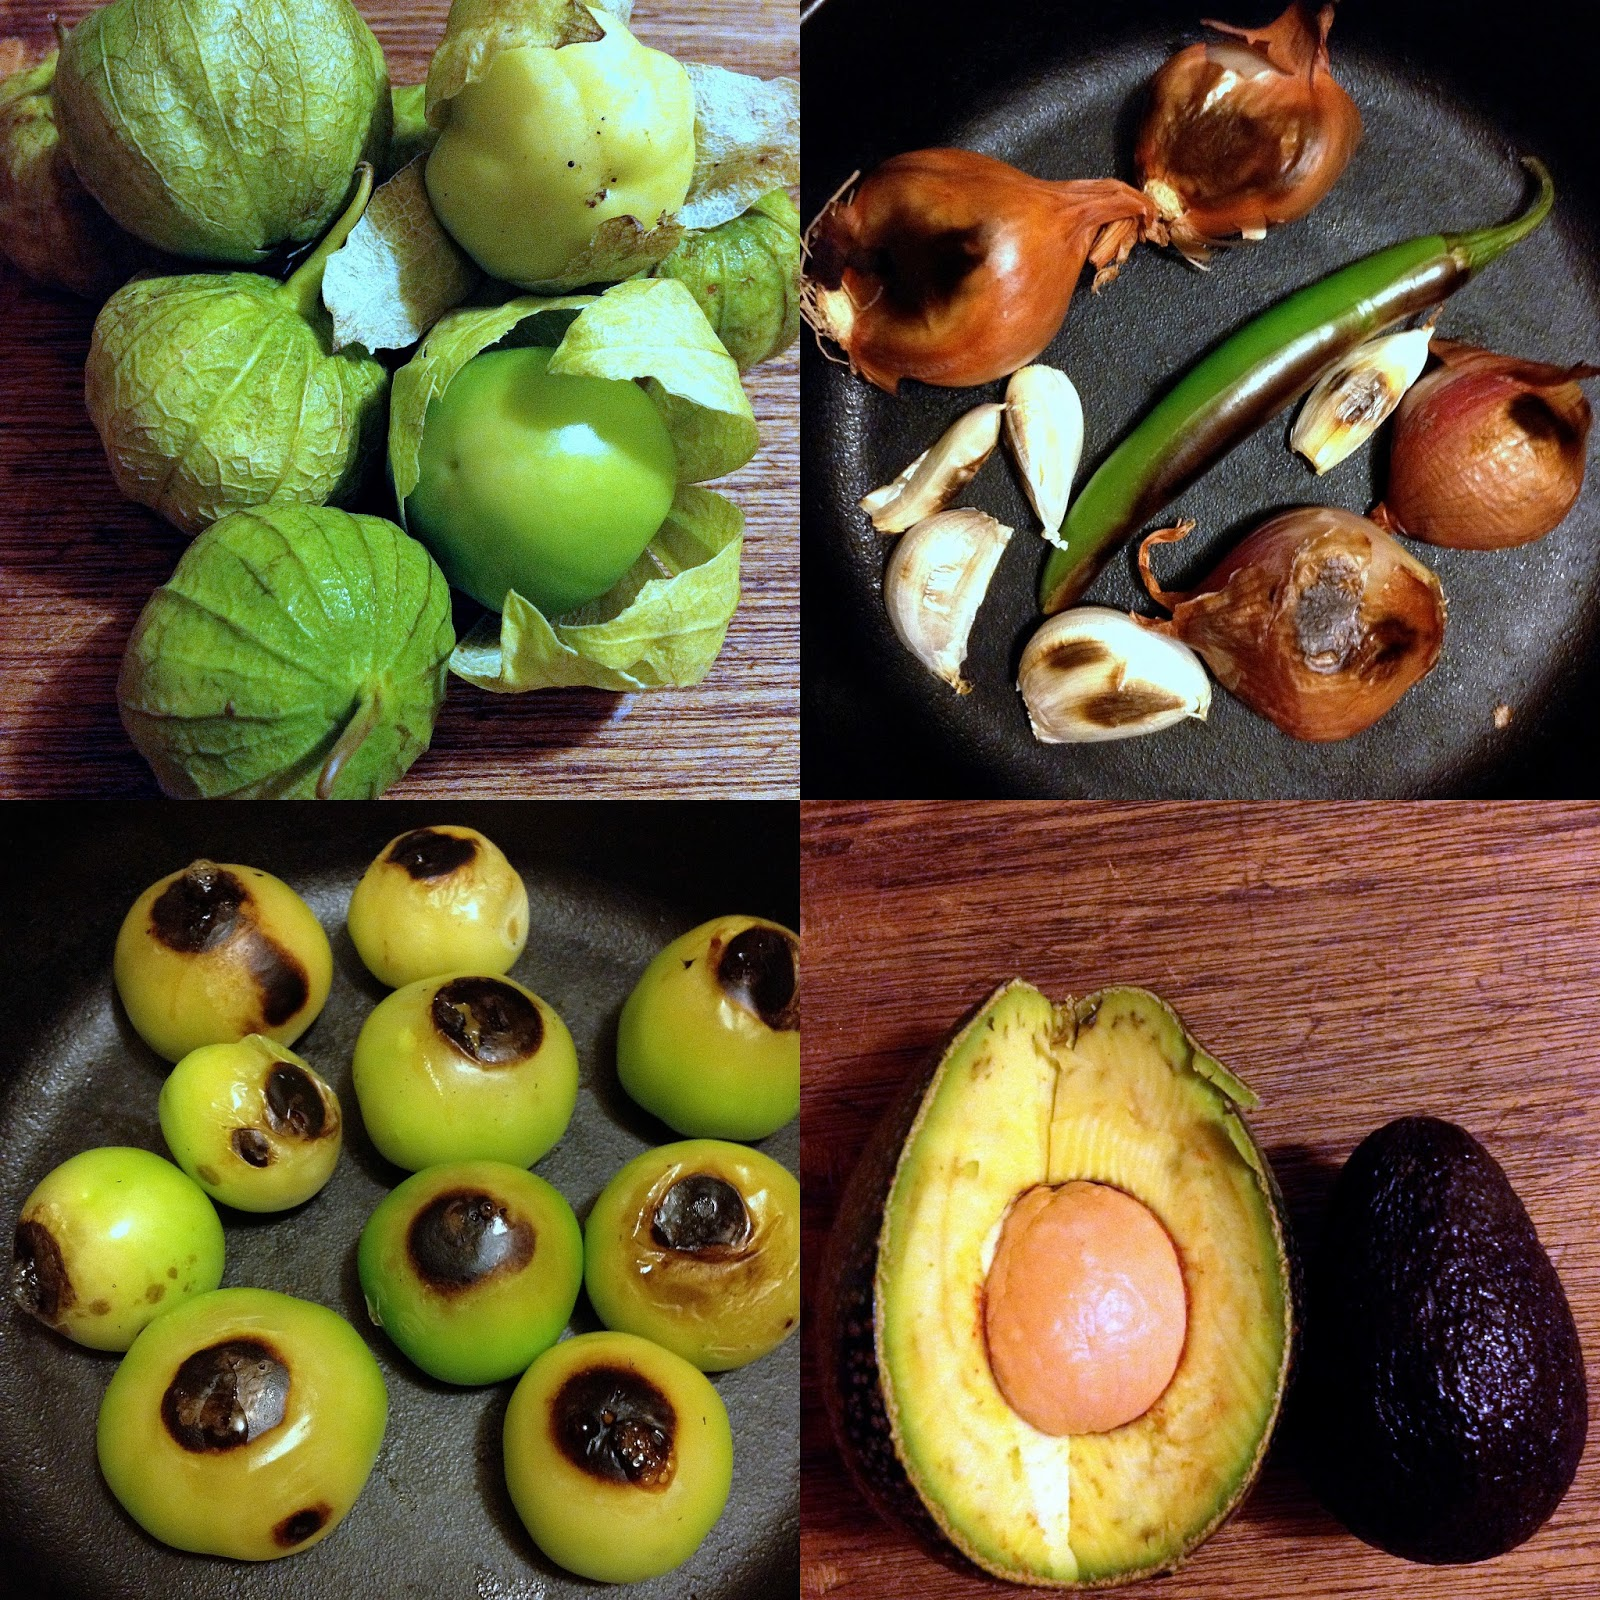 Keep the Peas: ROASTED TOMATILLO AND AVOCADO SALSA/SAUCE